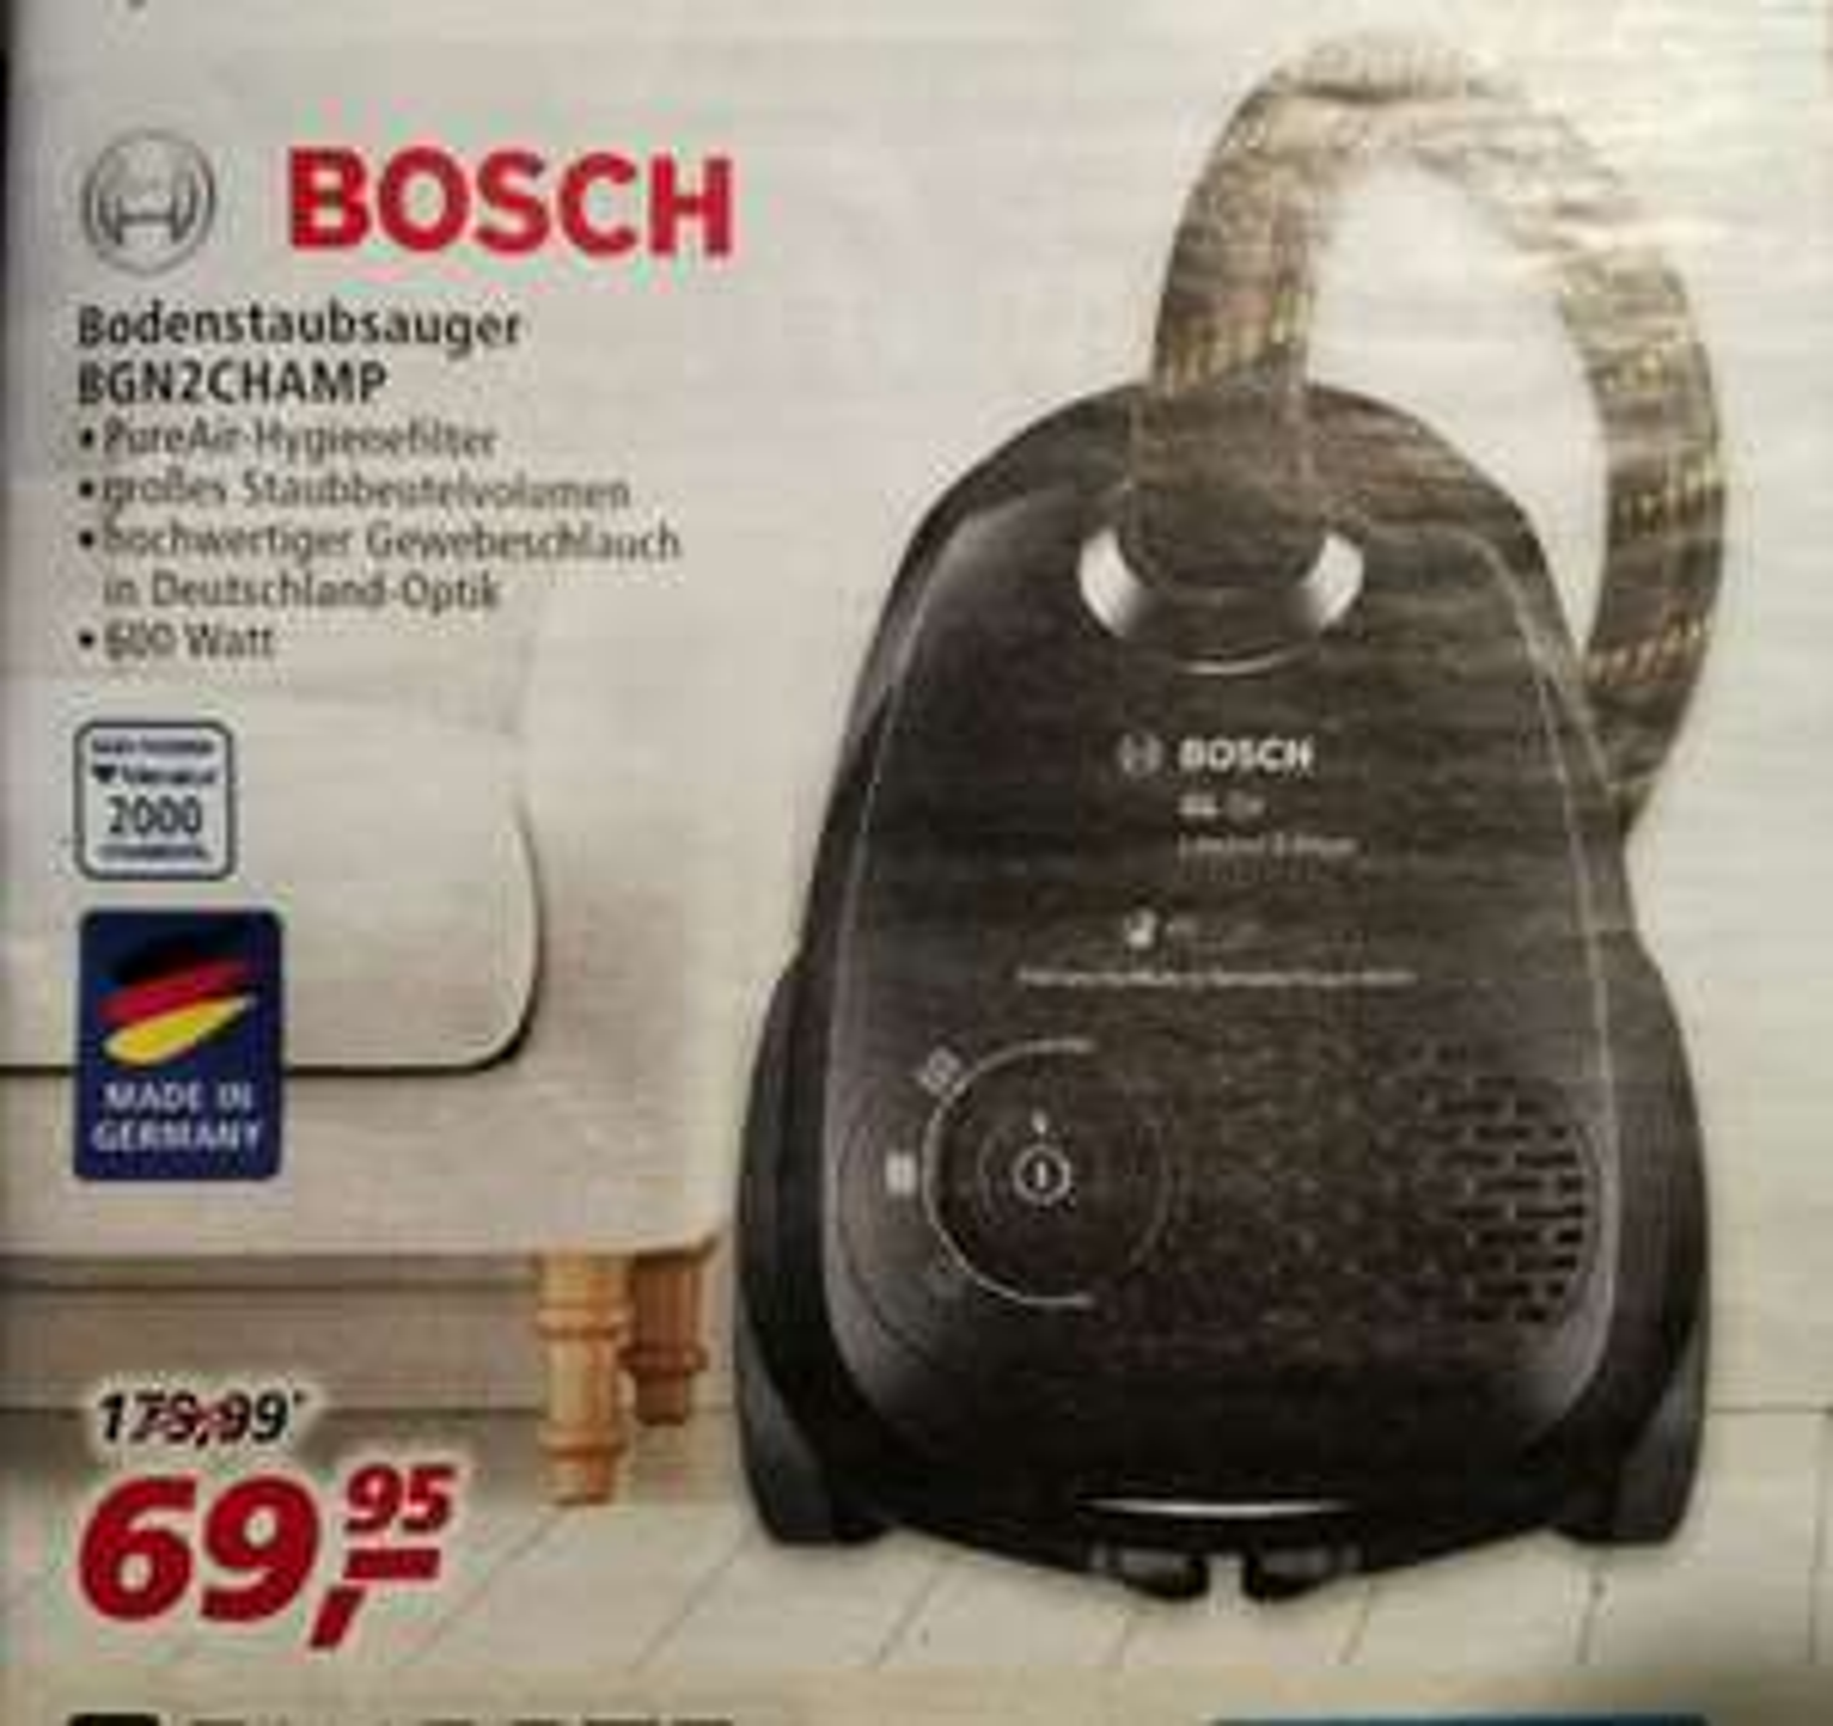 Bosch Staubsauger BGN2CHAMP (Markthalle /Lokal?)